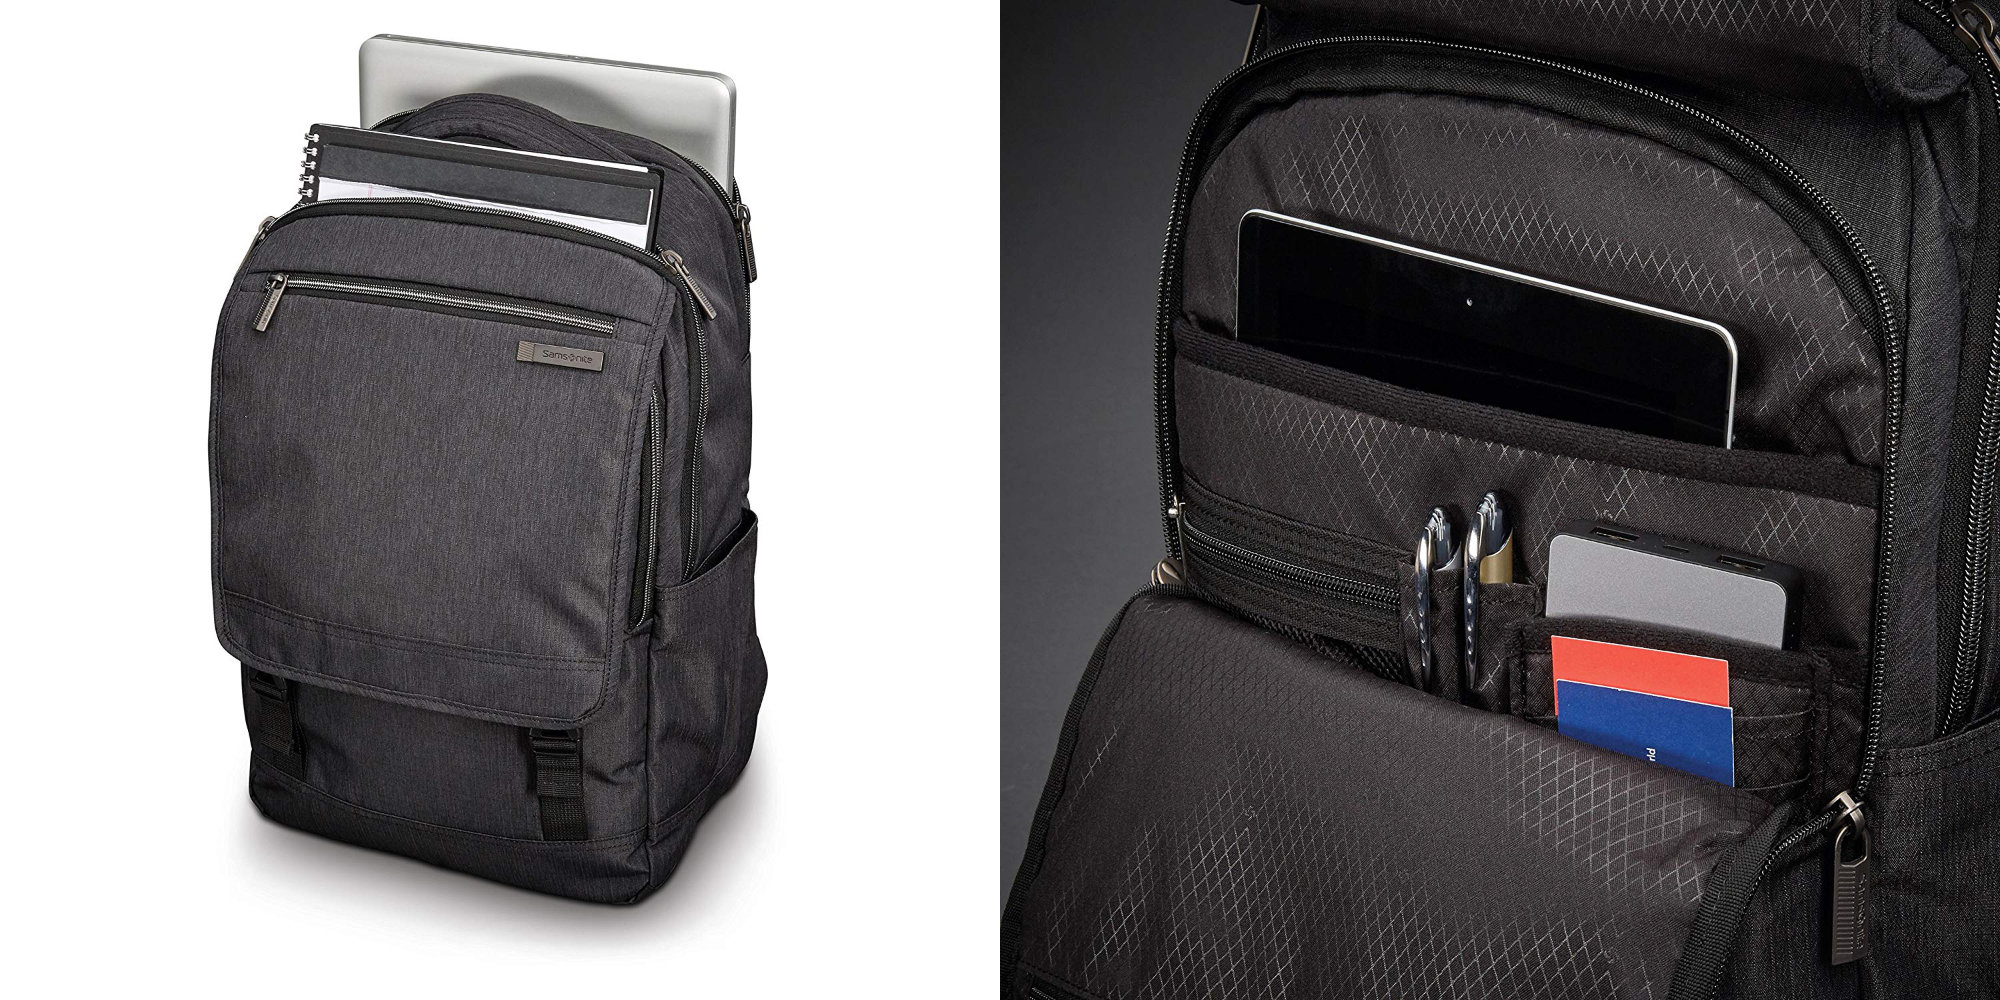 Samsonite's Modern Paracycle Backpack is MacBook Pro and iPad-ready: $67 (Reg. $90), more